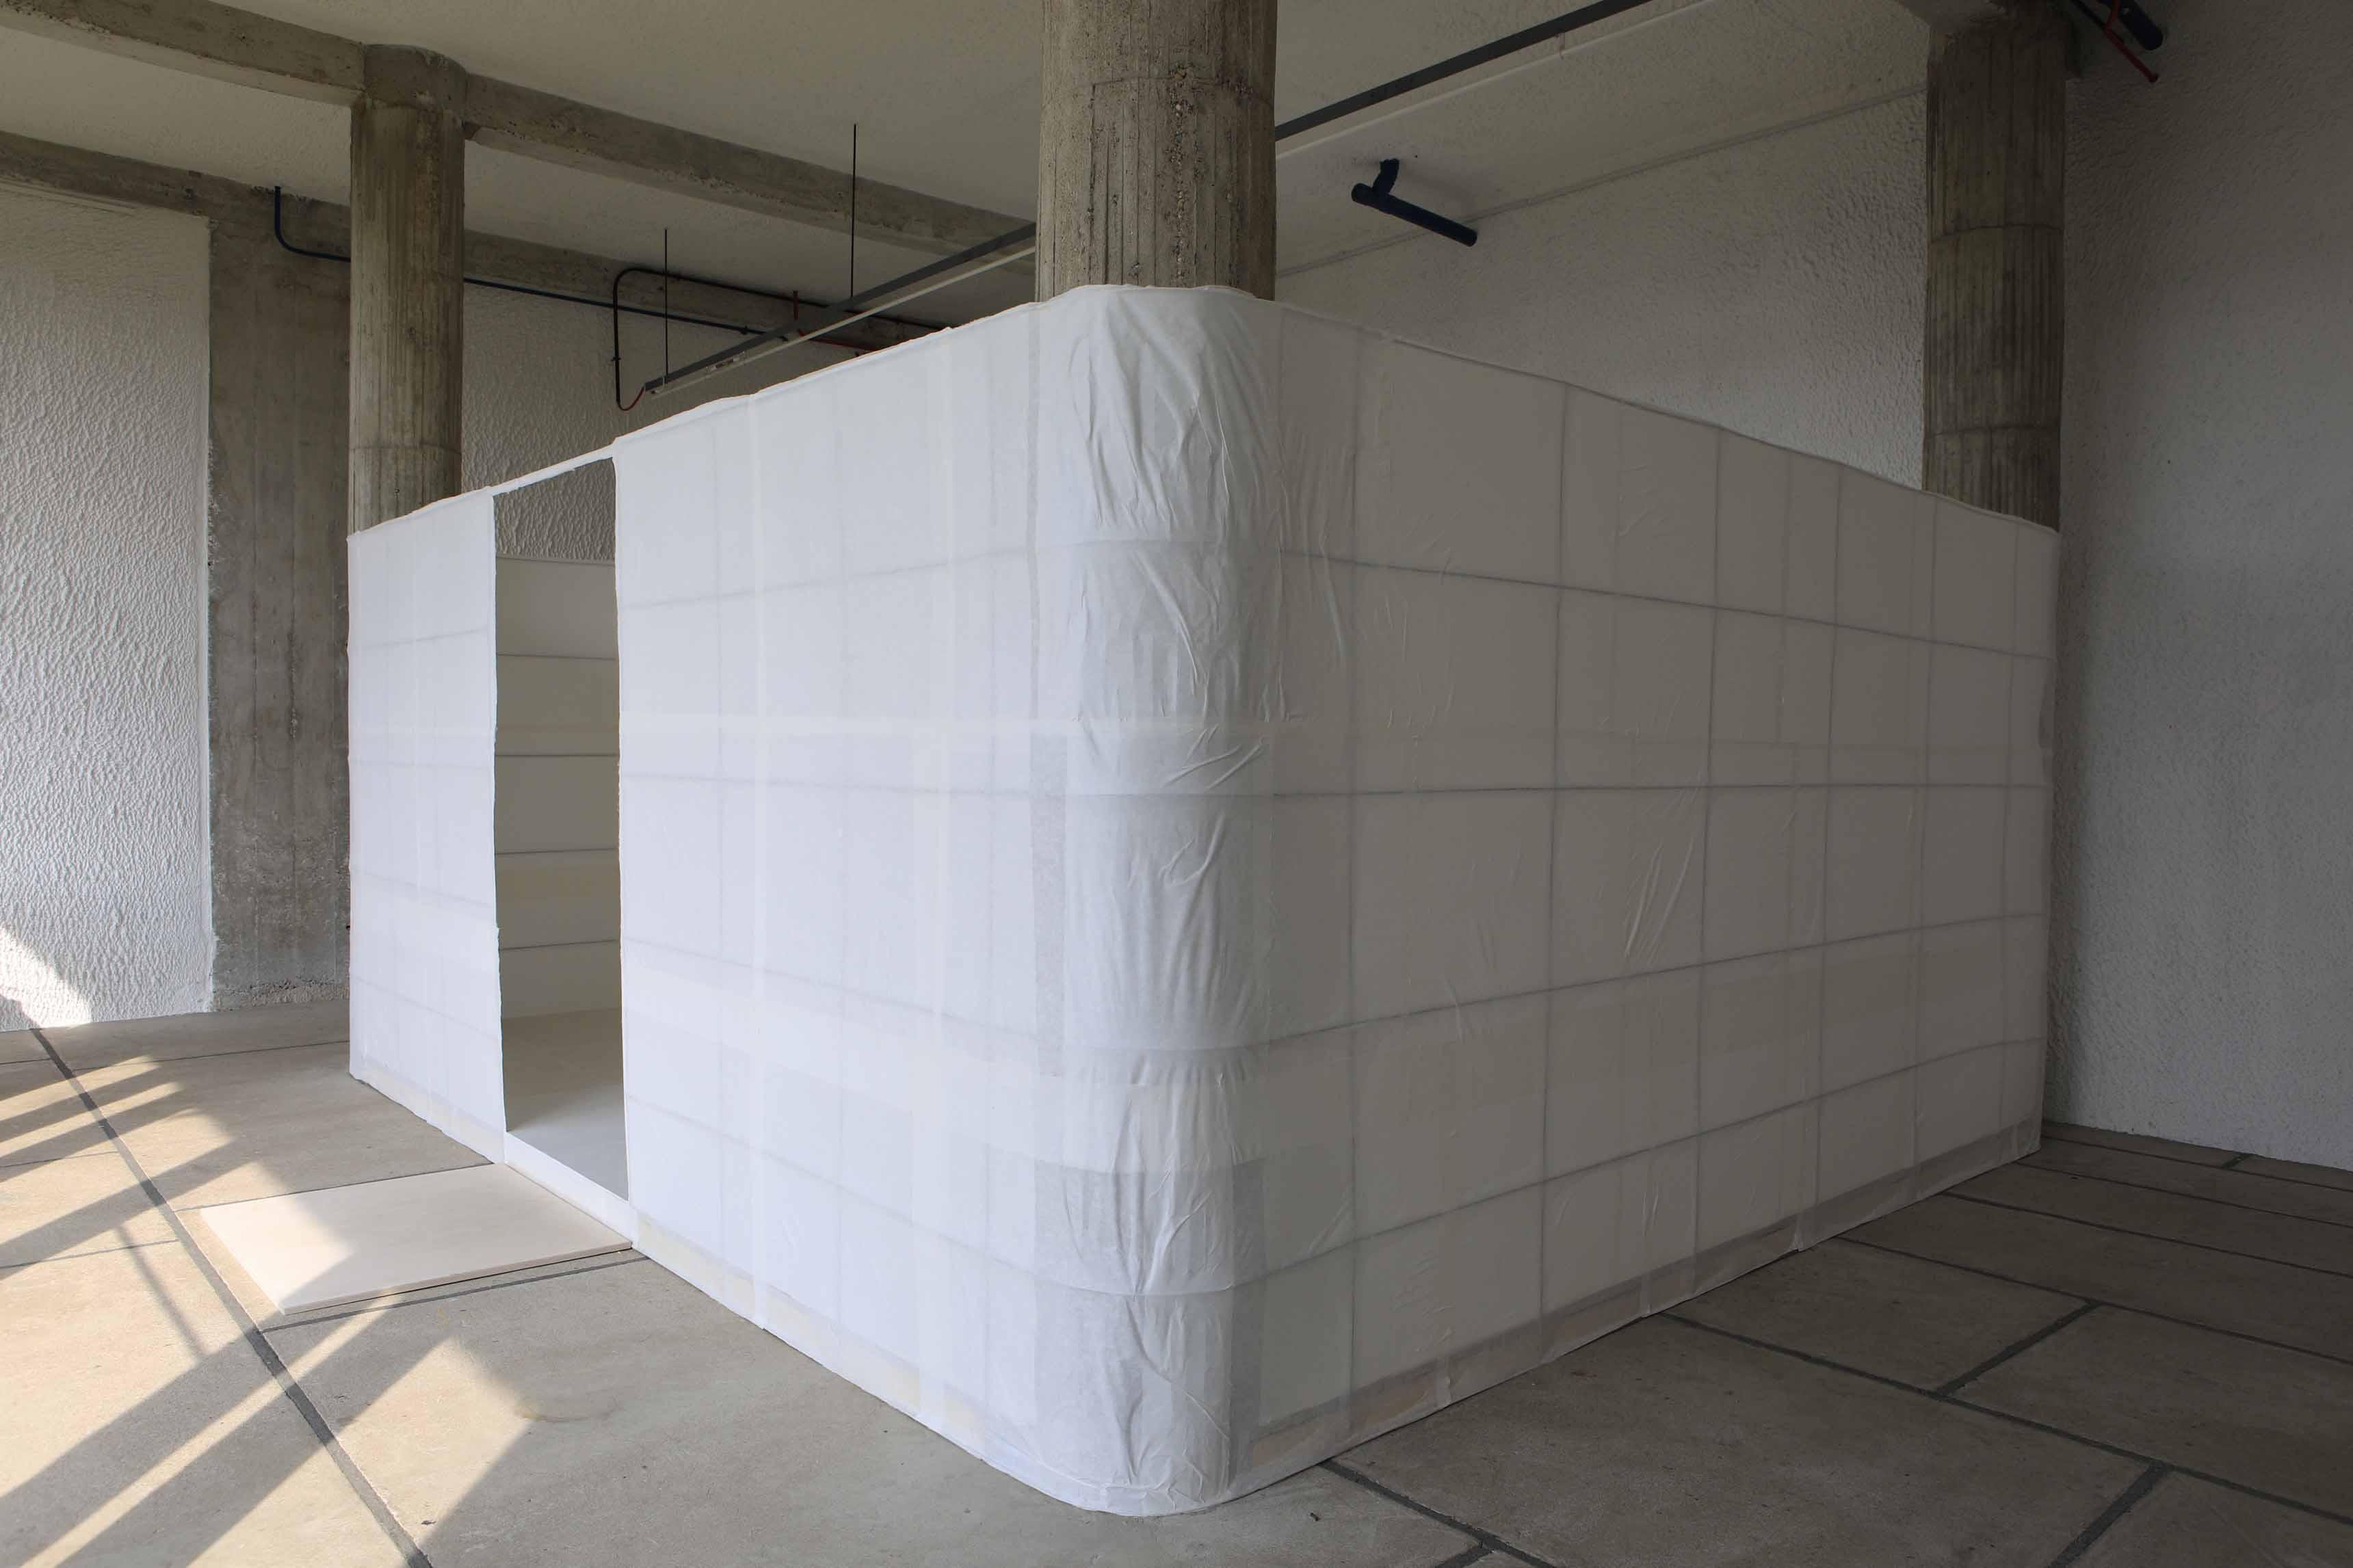 UFAN Lee, Relatum - Room, 2017 ©Jean-Philippe Simard